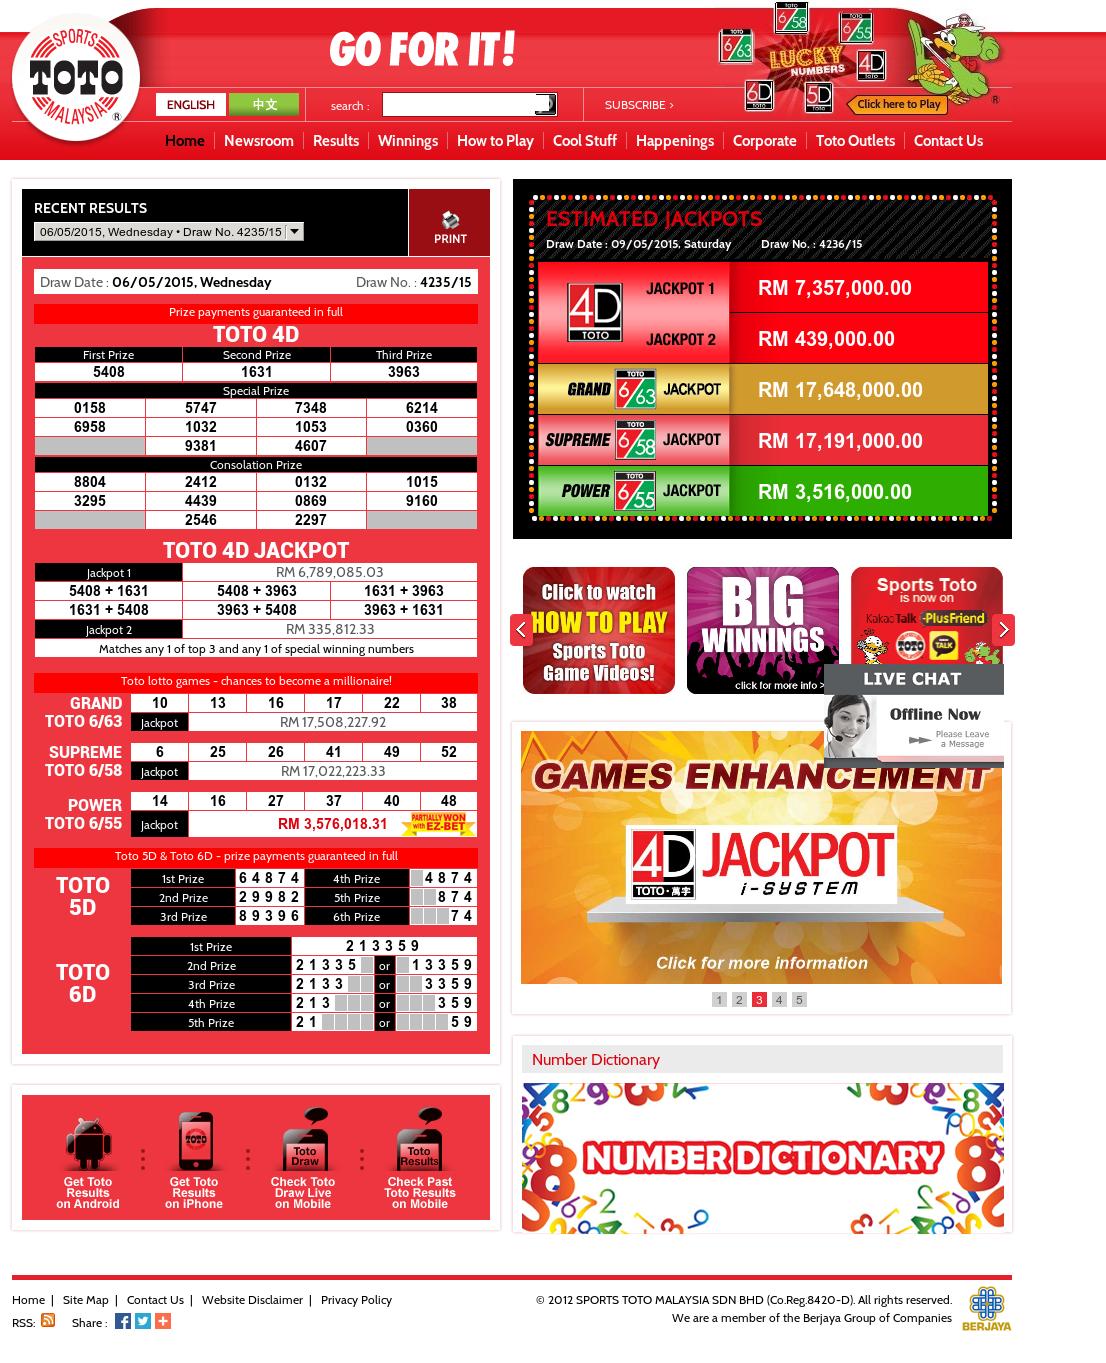 Sportstoto Competitors, Revenue and Employees - Owler Company Profile